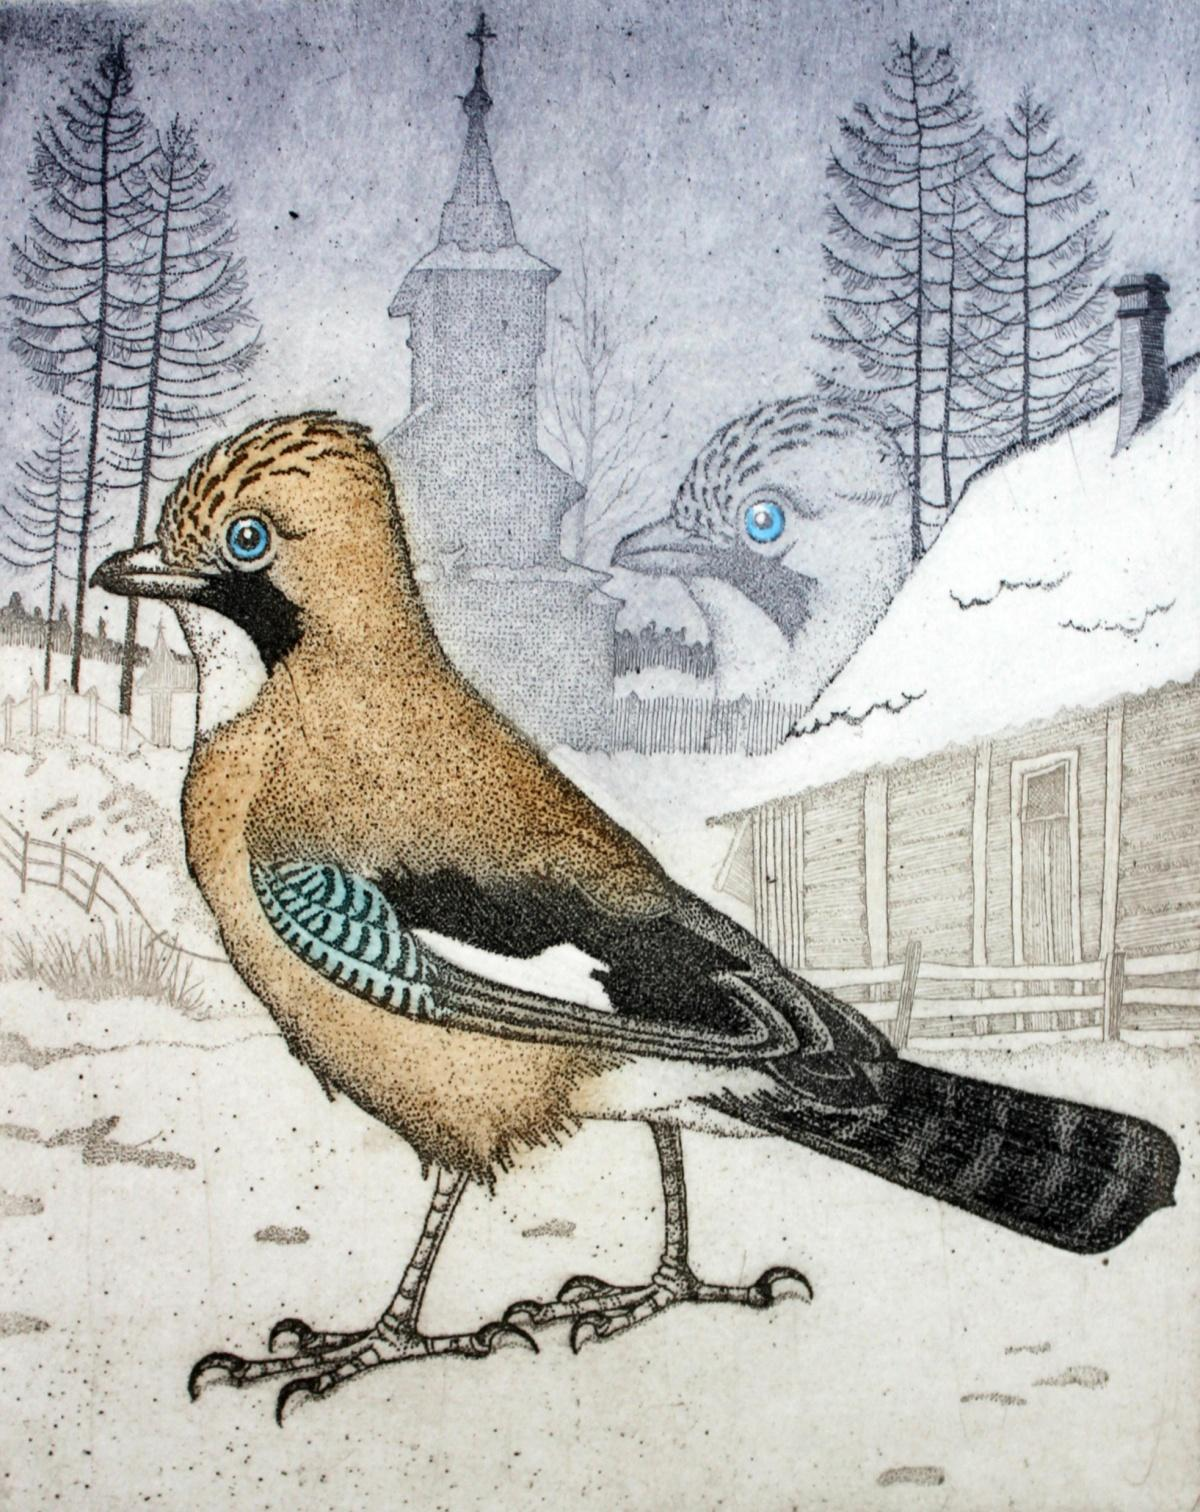 Untravelling jay - Figurative print, Animals, Birds